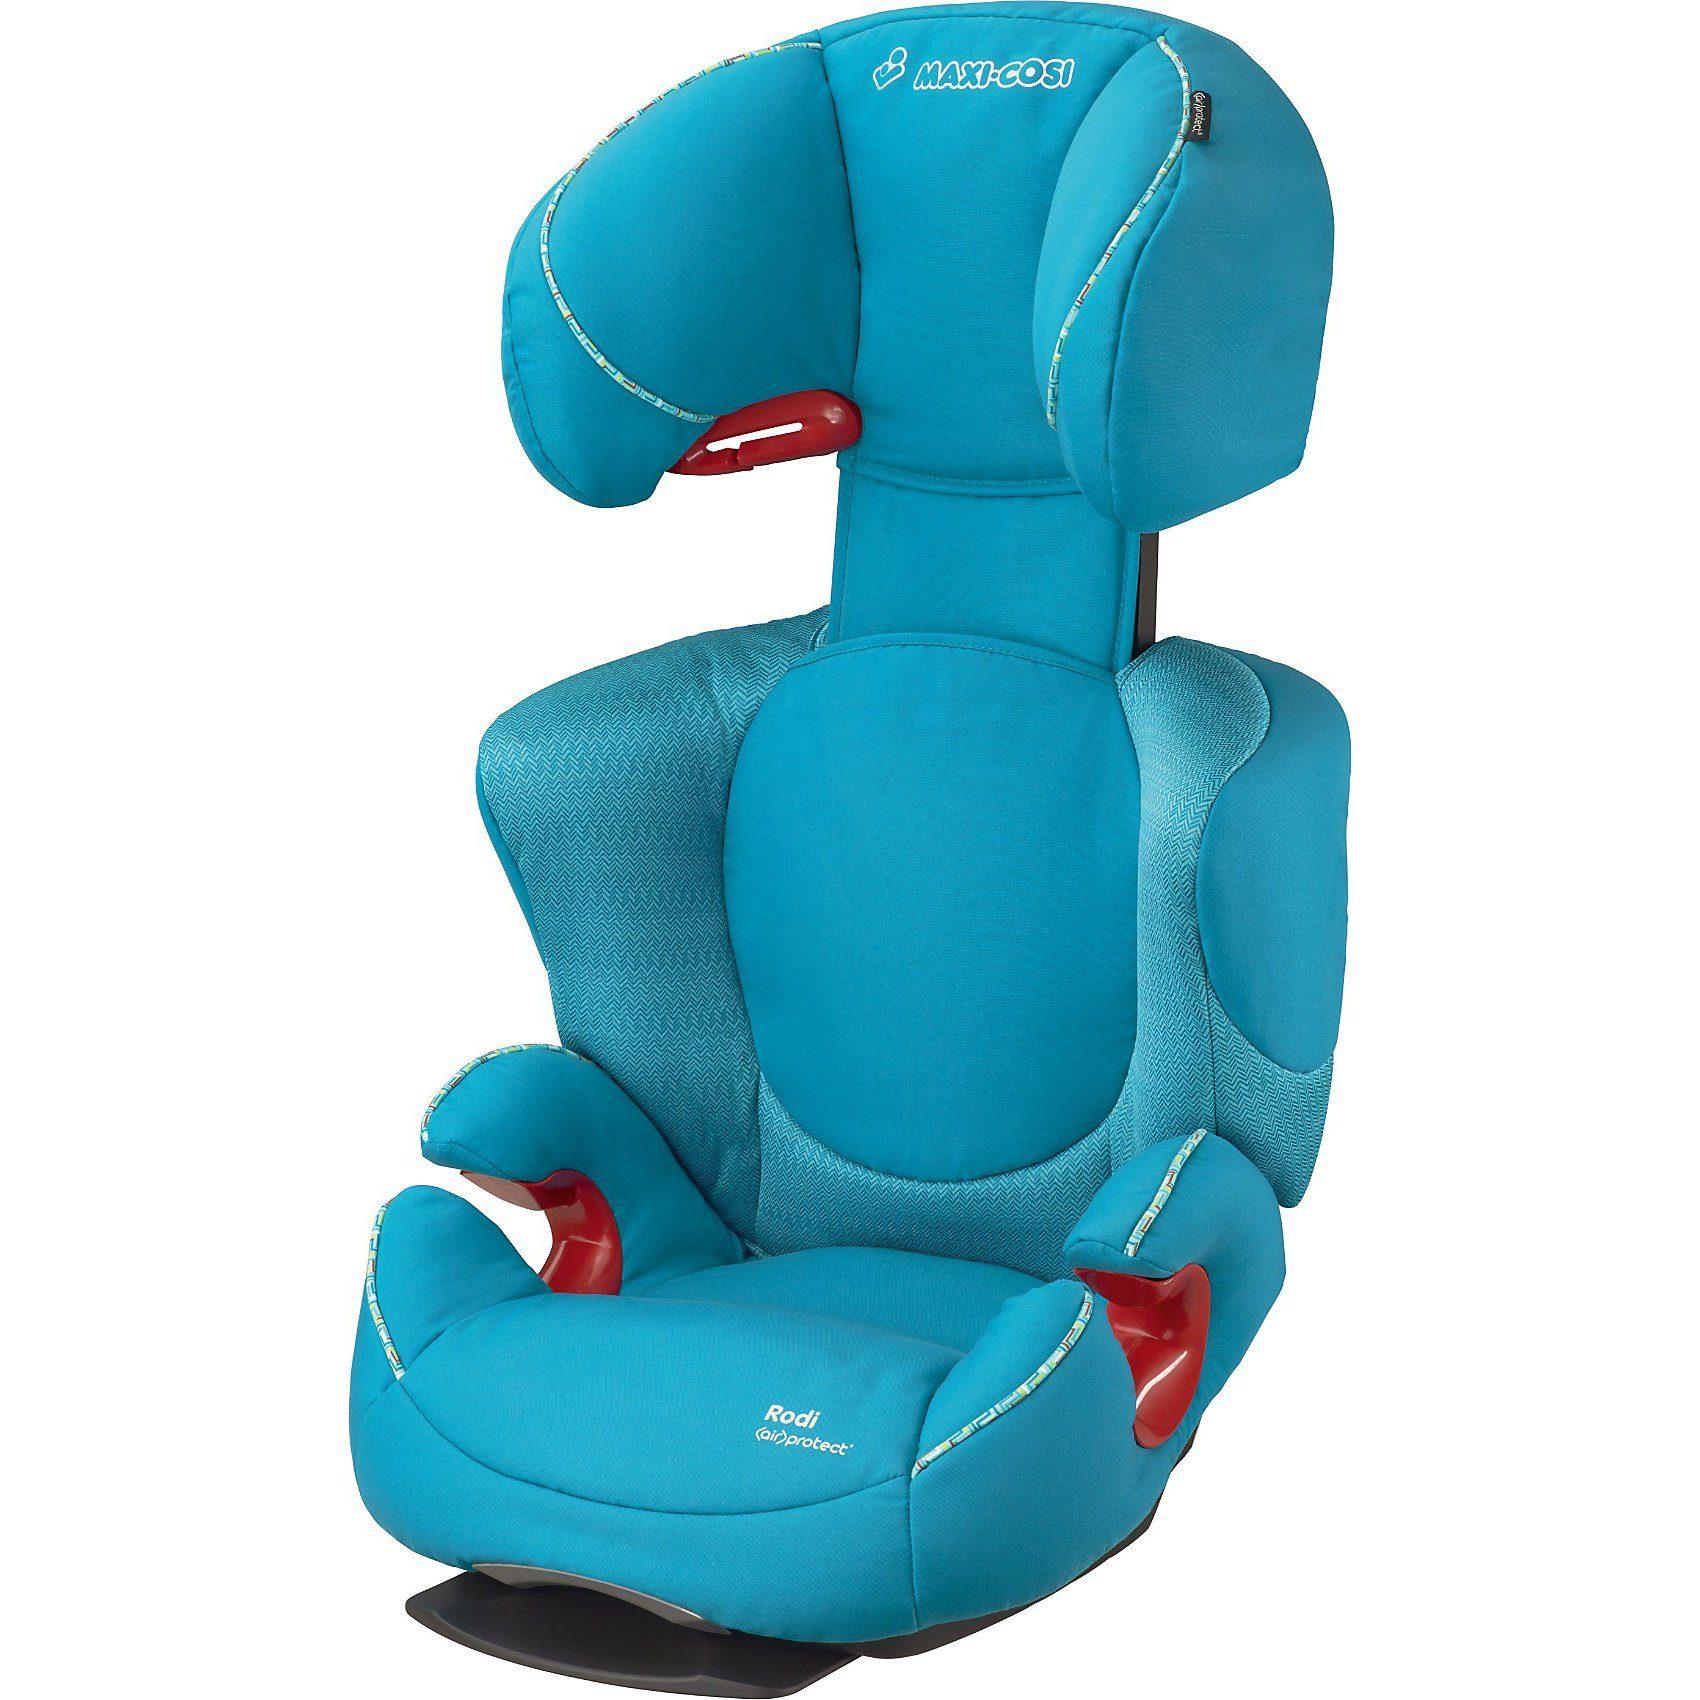 Maxi-Cosi Auto-Kindersitz Rodi AirProtect, Mosaic Blue, 2017